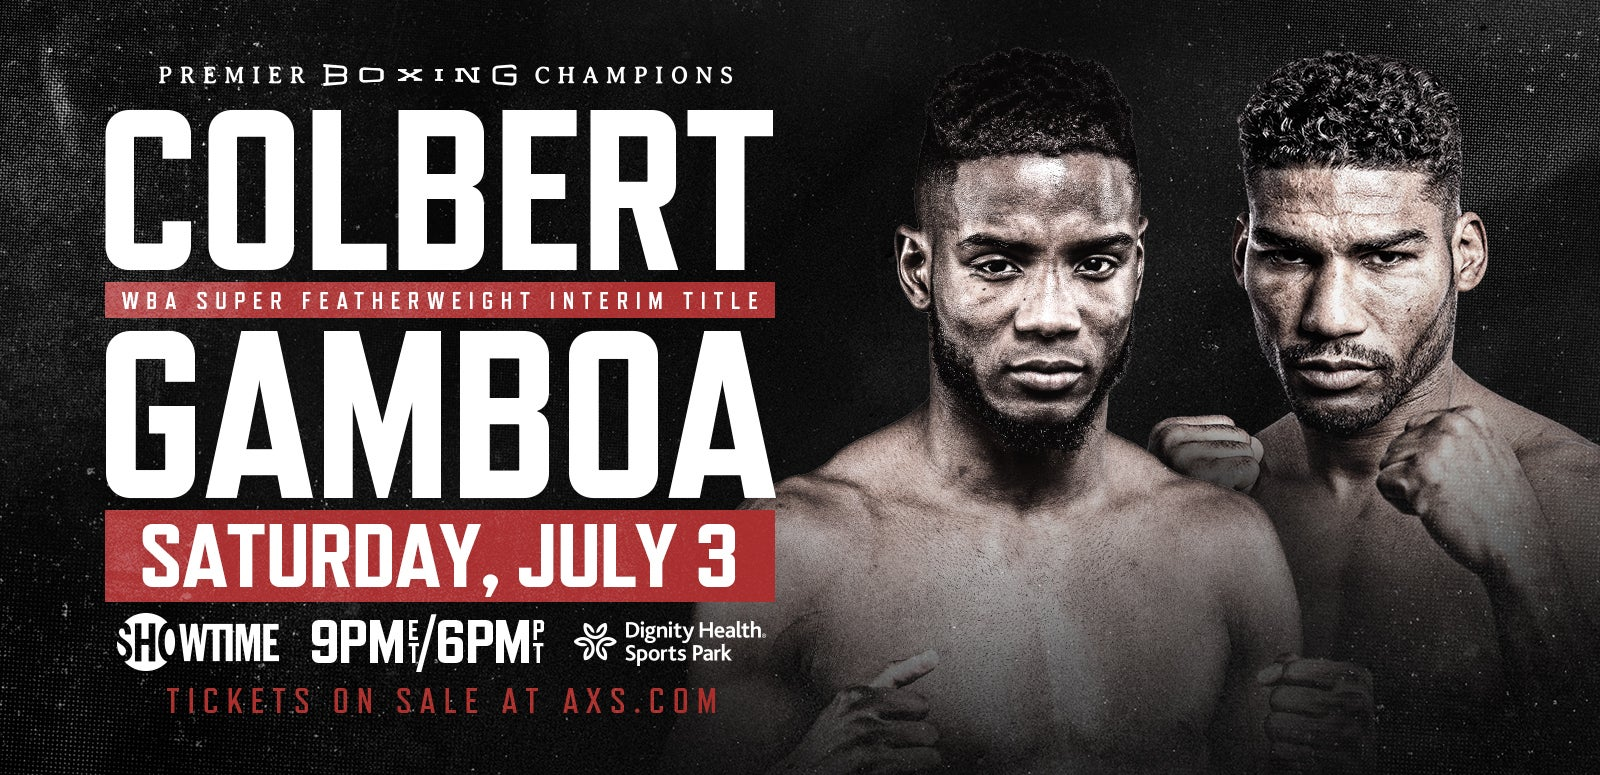 Premier Boxing Champions: Colbert vs Gamboa